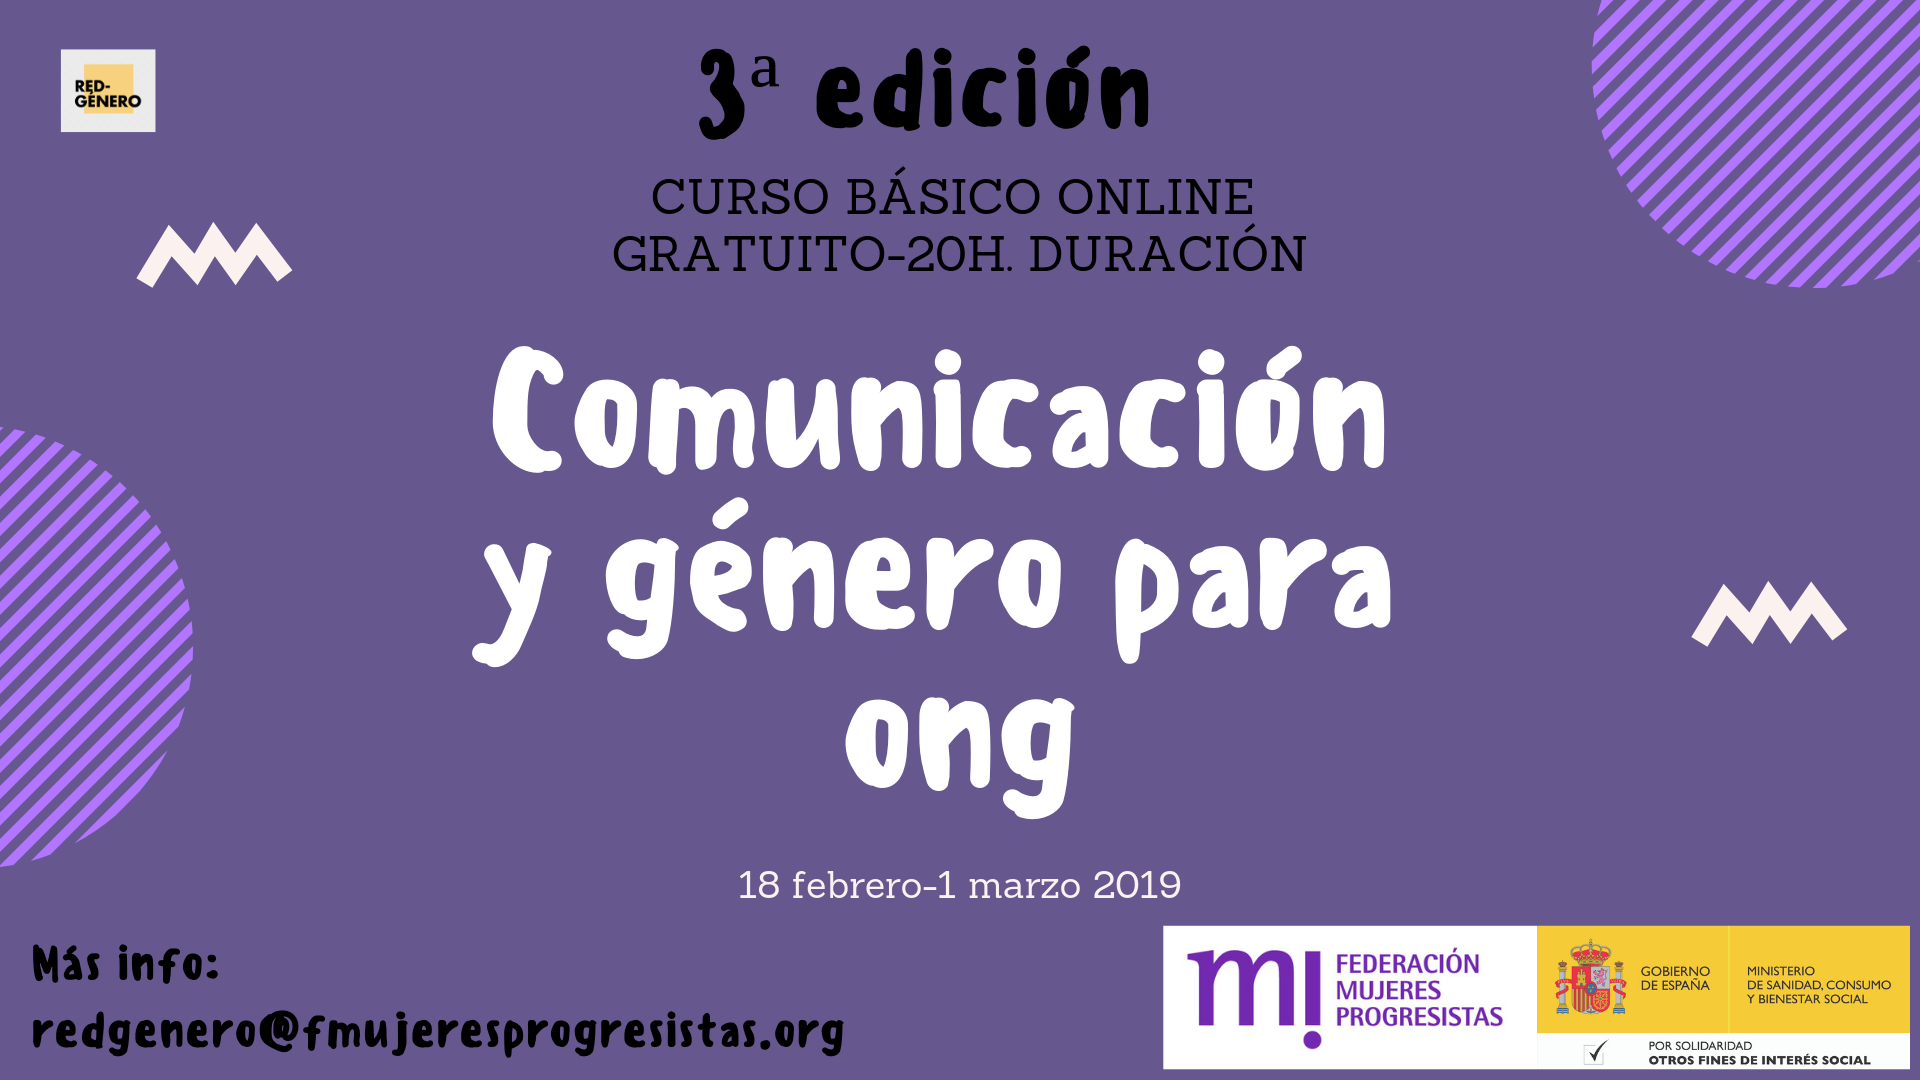 Course Image Curso de Comunicación y Género. 3ª edición